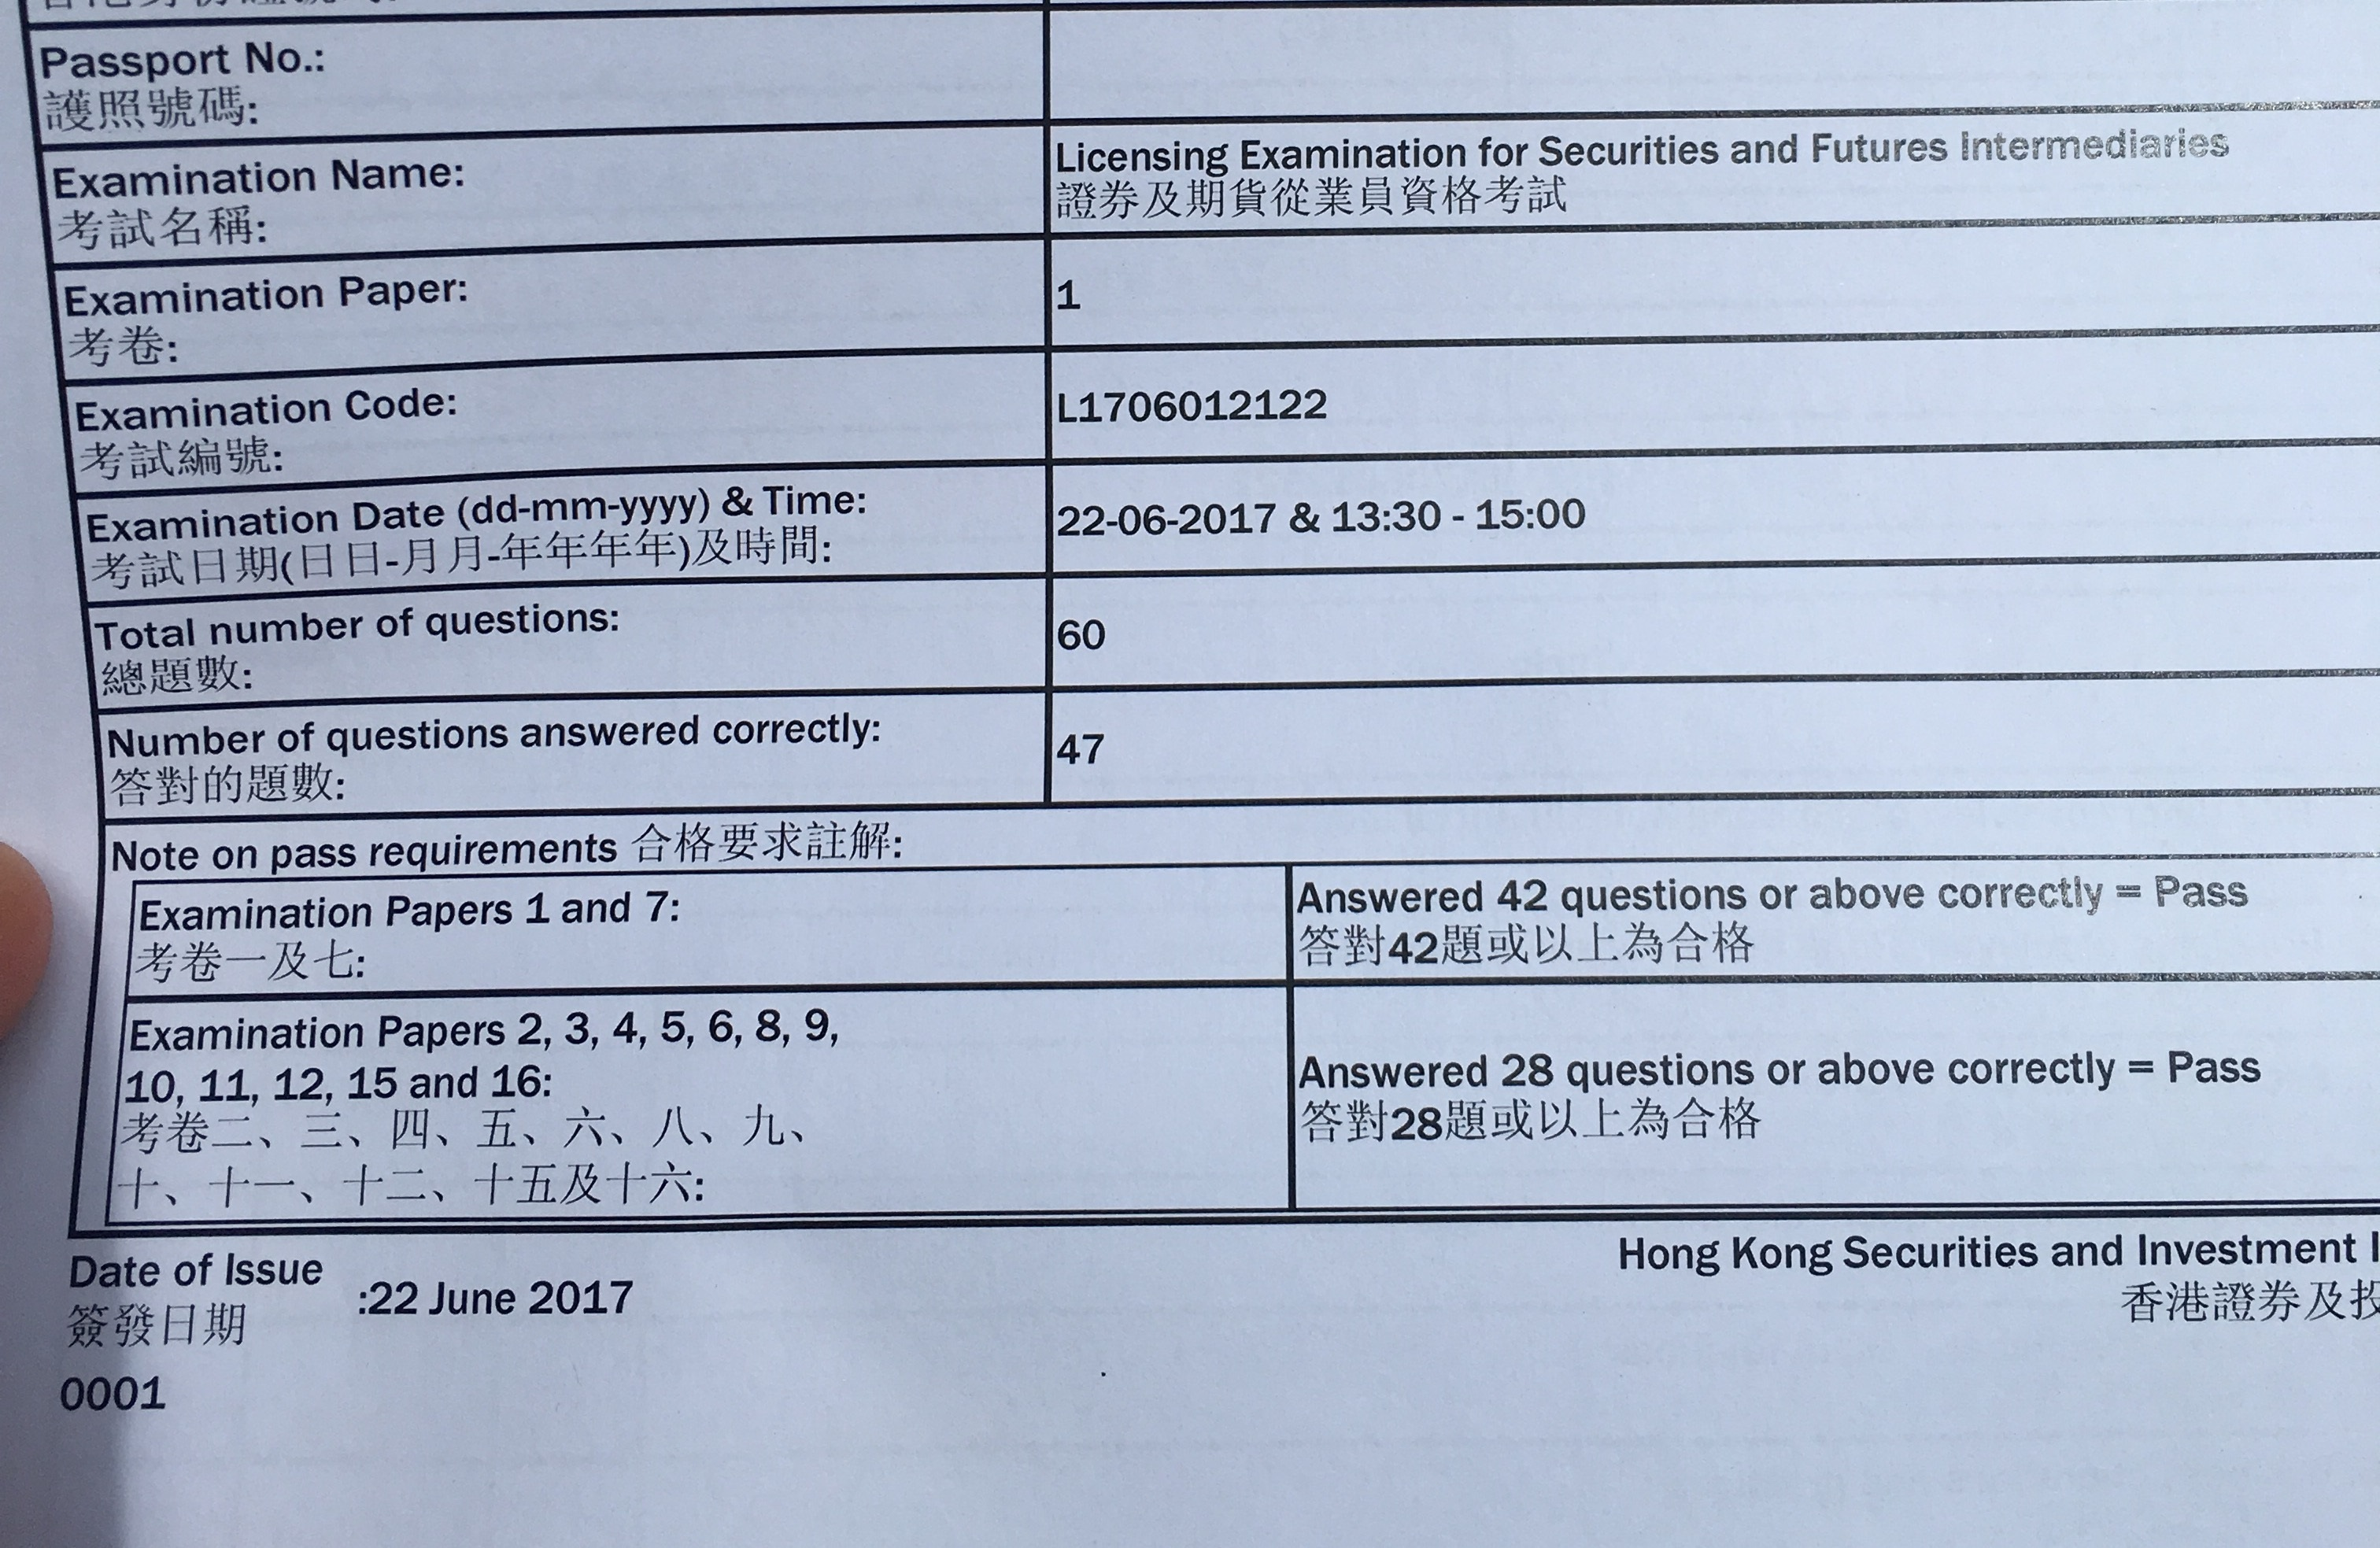 XX 22/6/2017 LE Paper 1 證券期貨從業員資格考試卷一 Pass